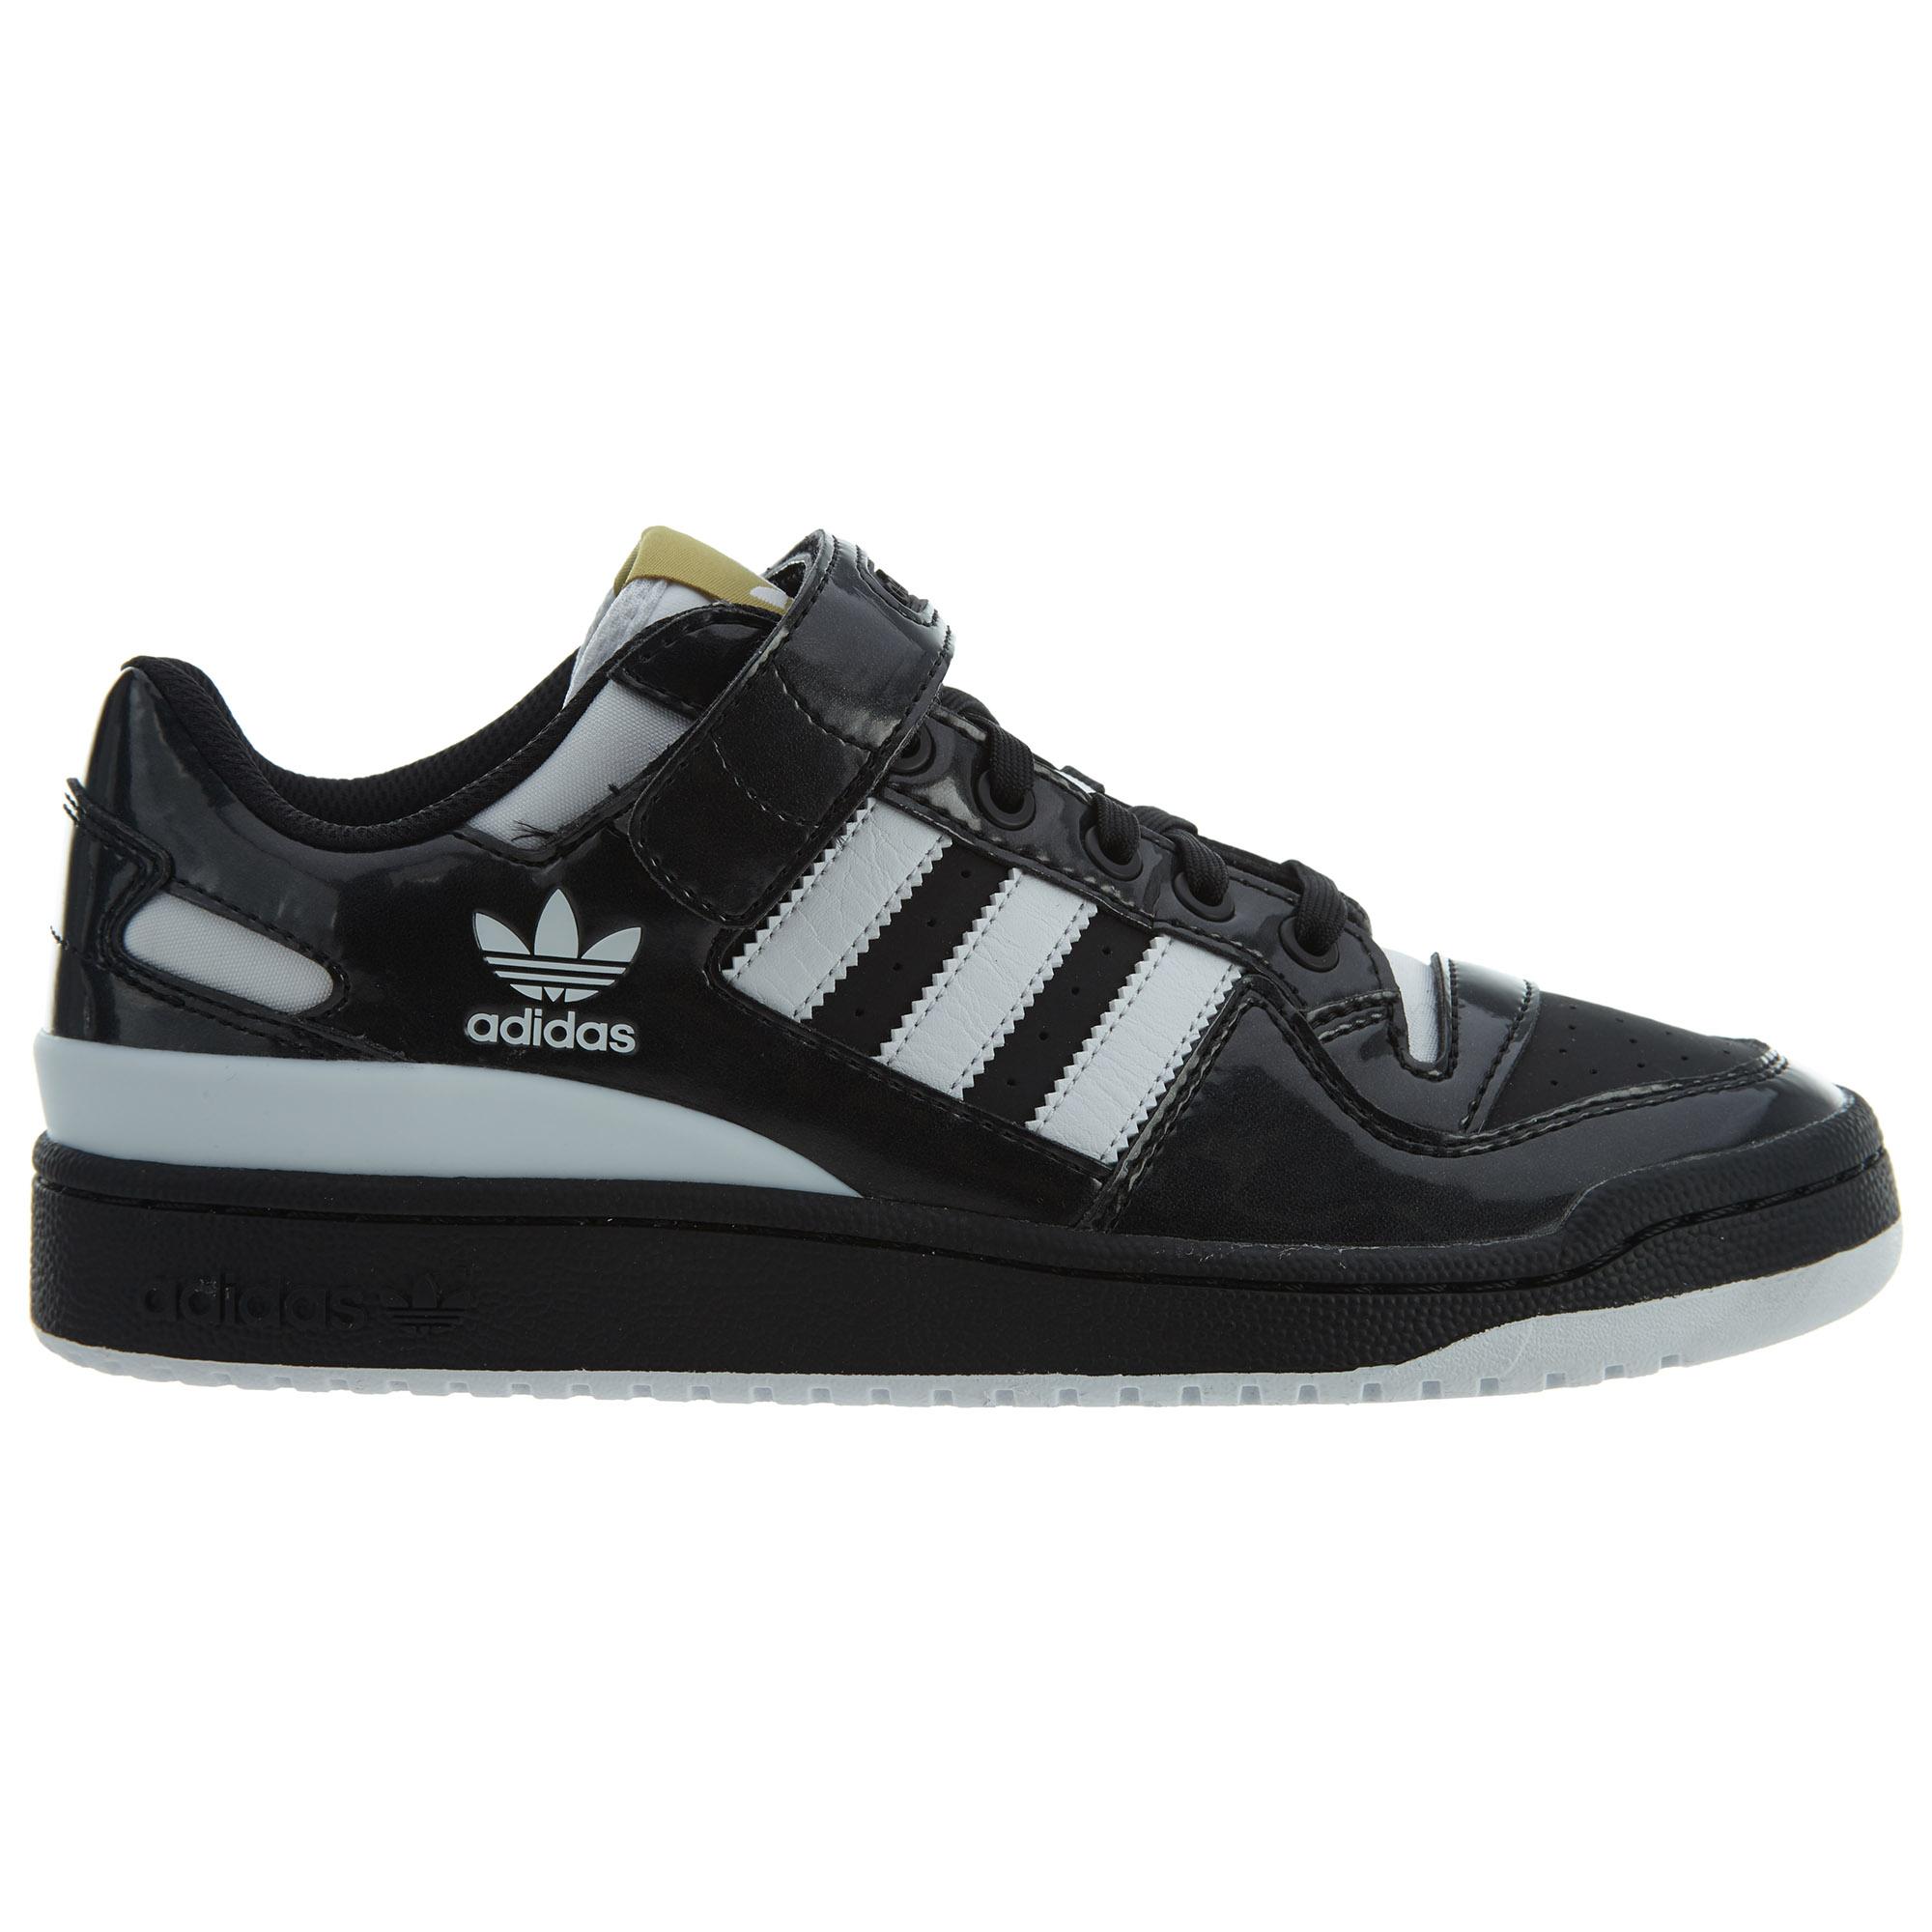 adidas forum low black